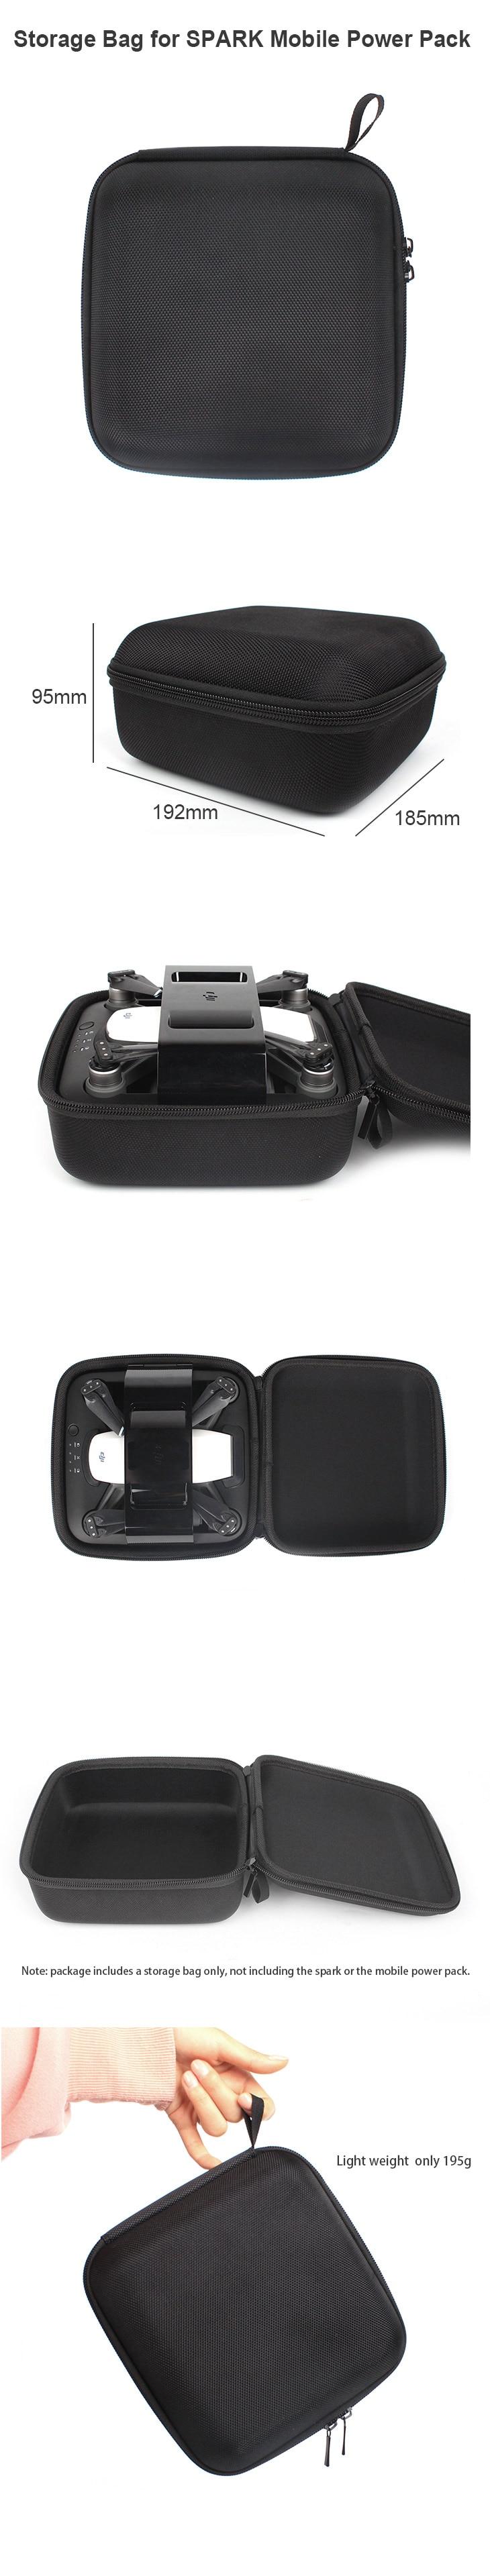 Portable Handheld Storage Bag Box Case for DJI SPARK Mobile Power Pack for DJI SPARK Camera Drone